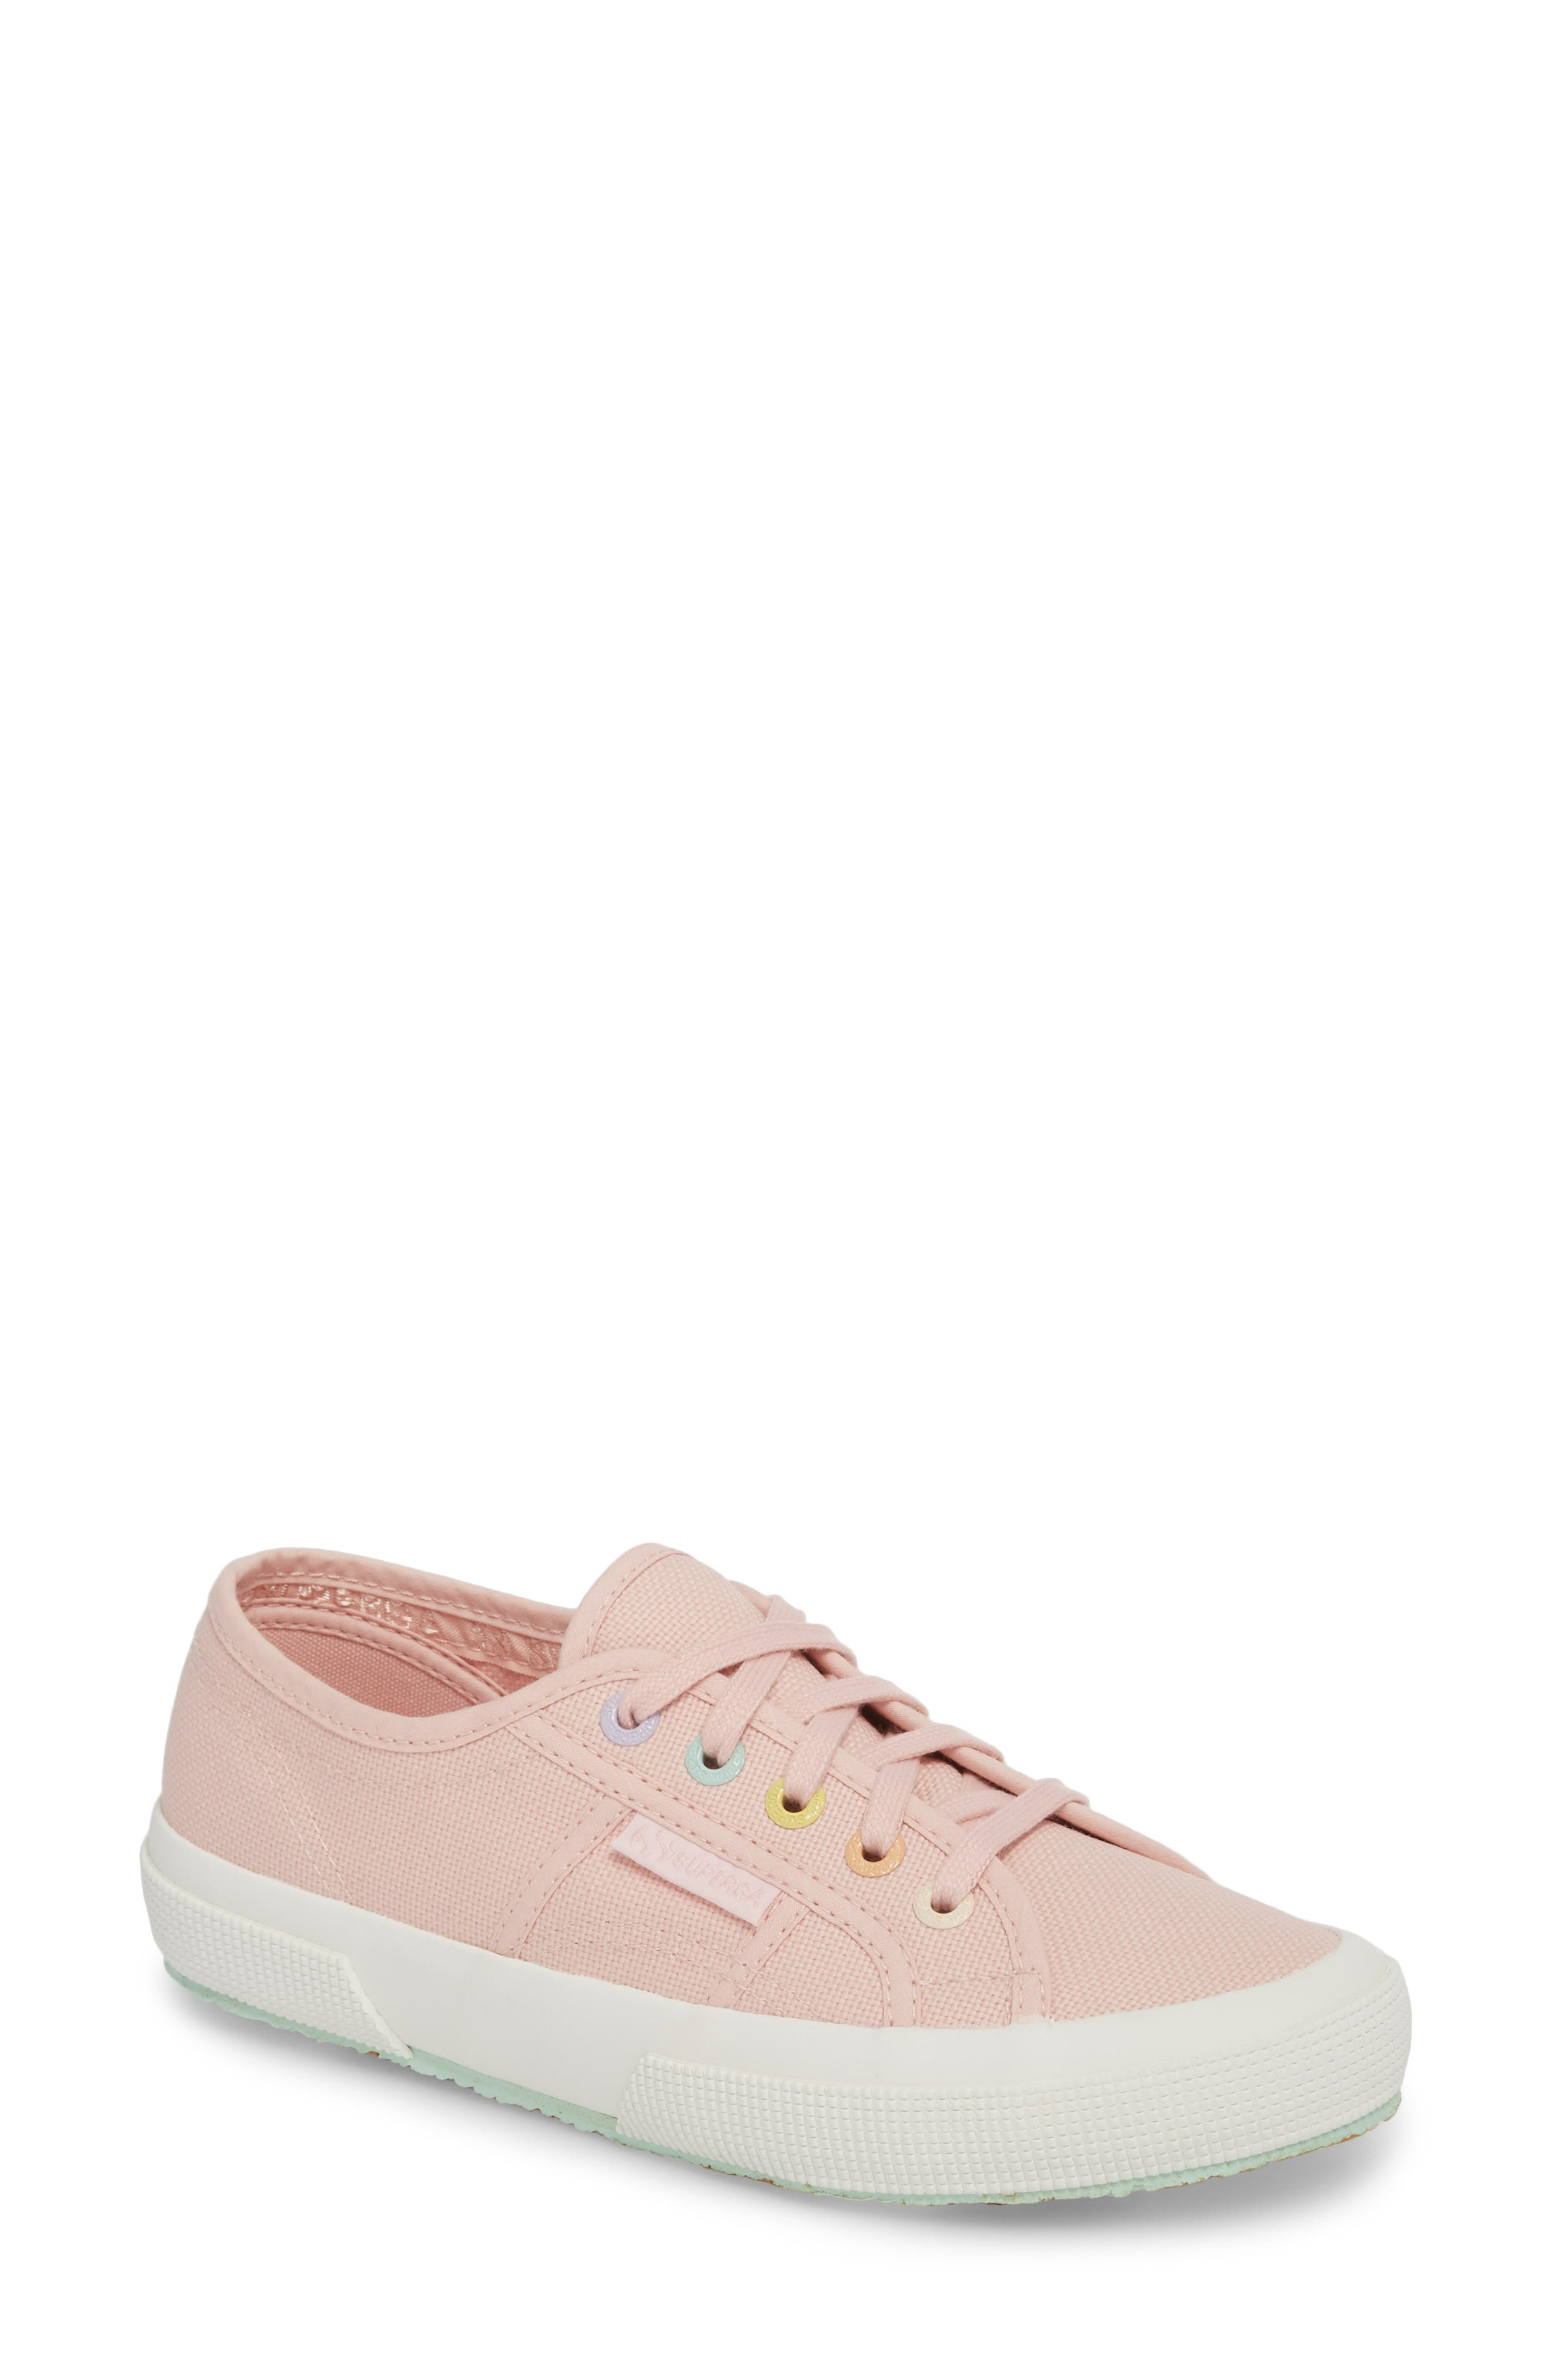 2750 Rainbow Sneaker,                             Main thumbnail 1, color,                             Light Pink